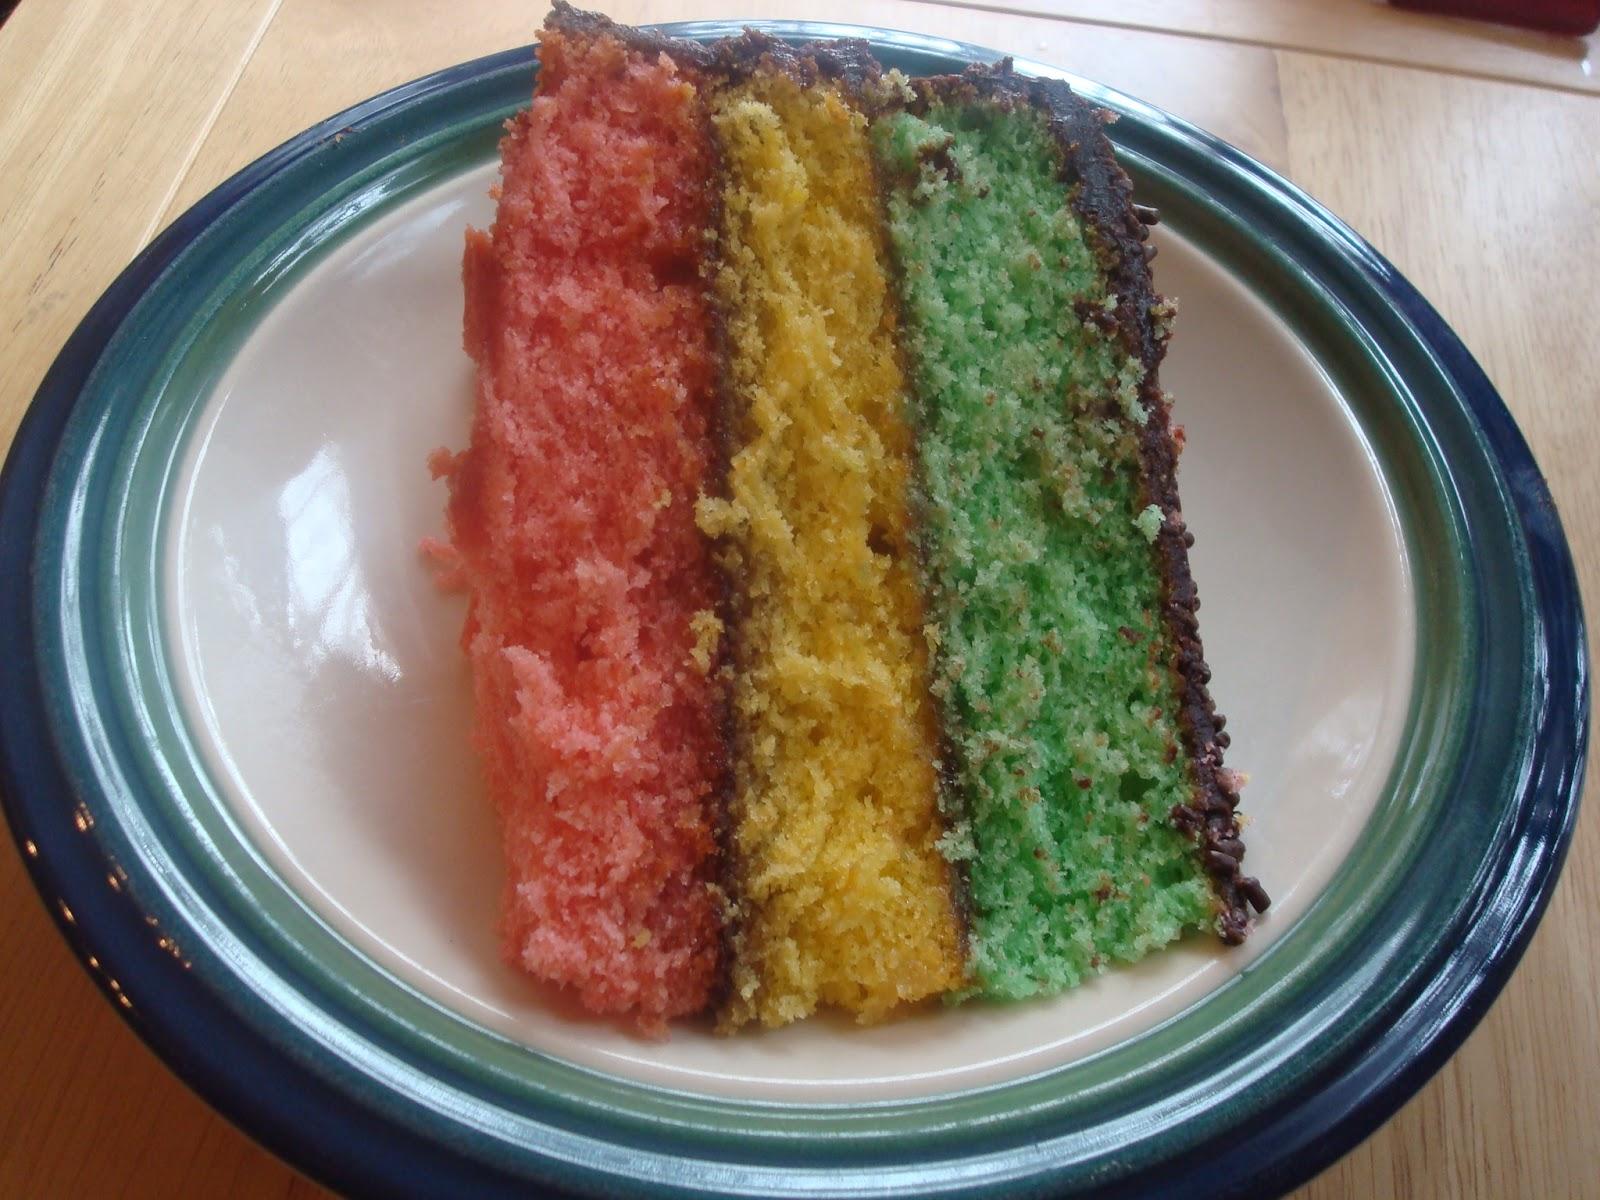 Rainbow Cake Recipe Italian: Mocha Me: Italian Rainbow Cookie Cake